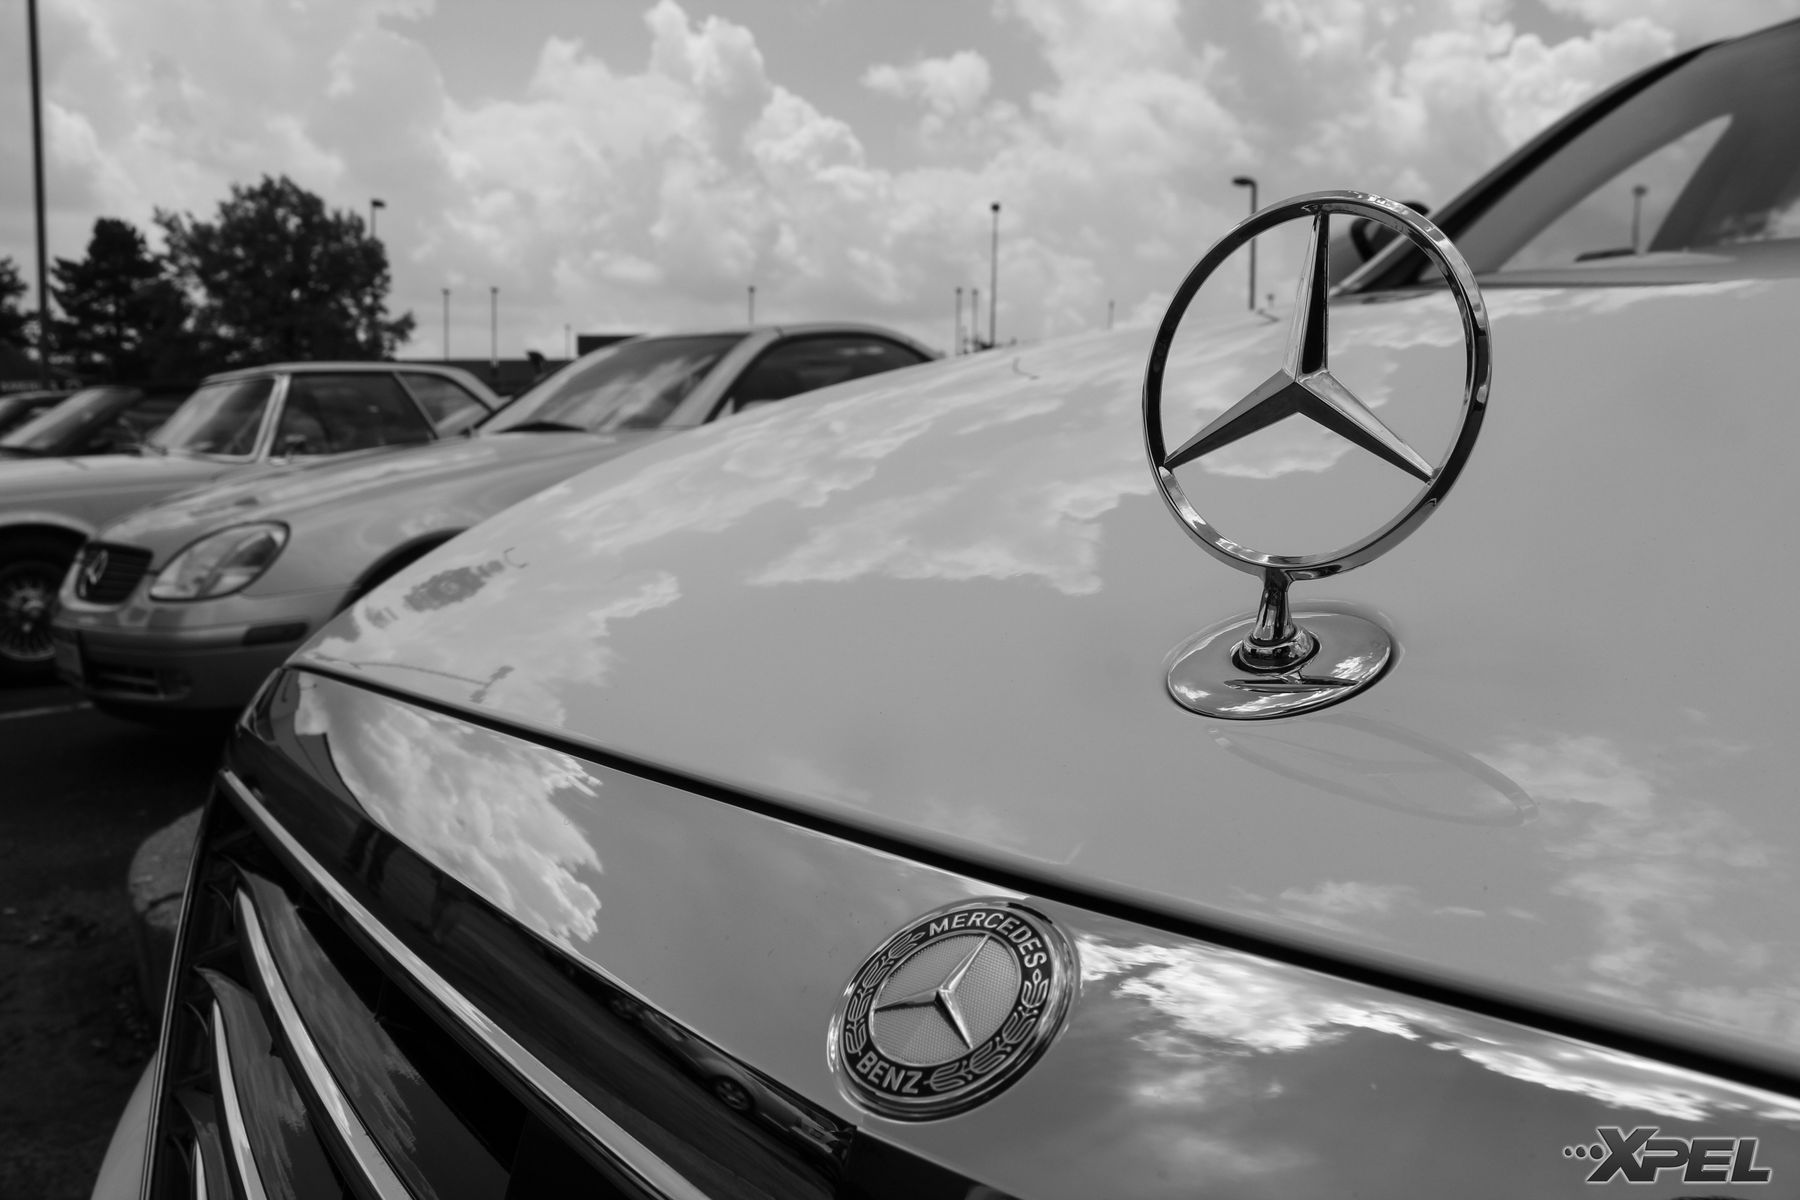 Mercedes-Benz  | Beautiful day for a car event in Cincinnati, Ohio for StarTech